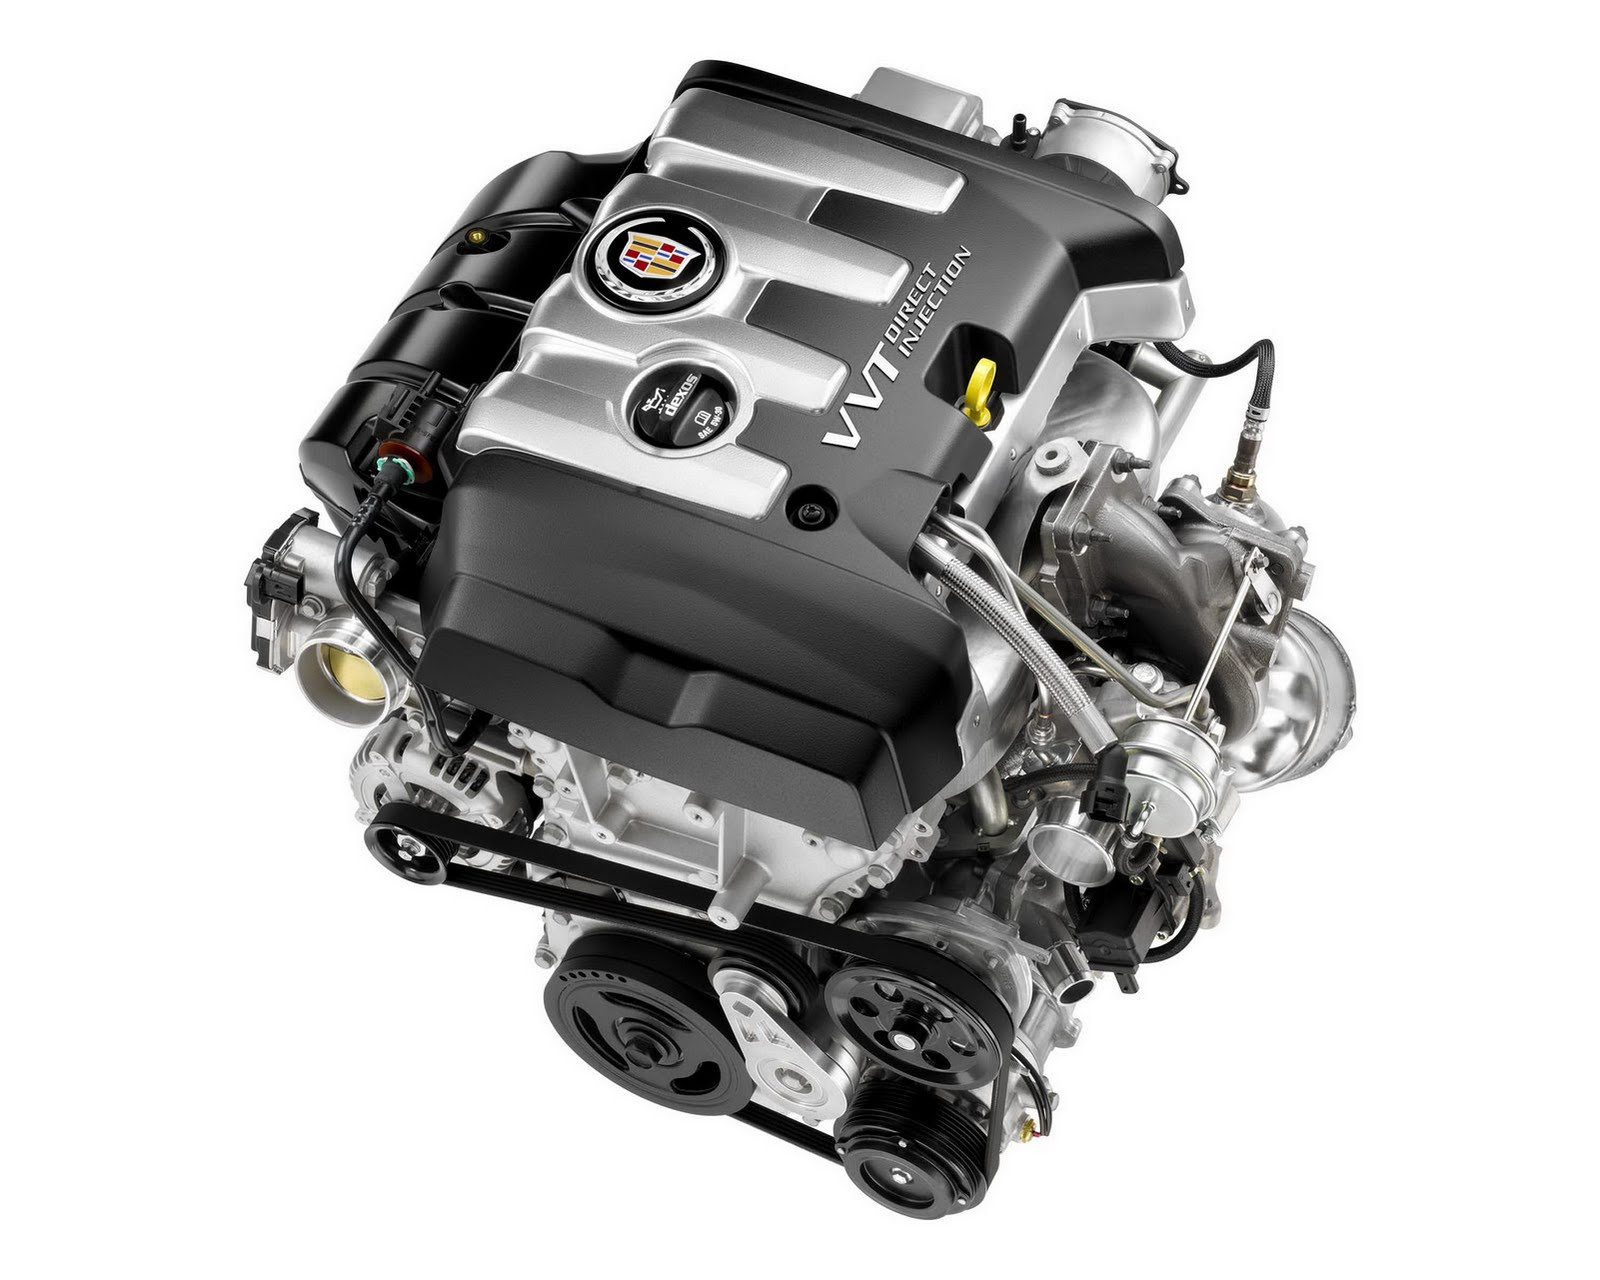 2013 Cadillac Ats 2 0 L Turbo >> 2013 Cadillac ATS Engines: 270 HP 2.0L Turbo, 2.5L and 3.6L V6 - autoevolution